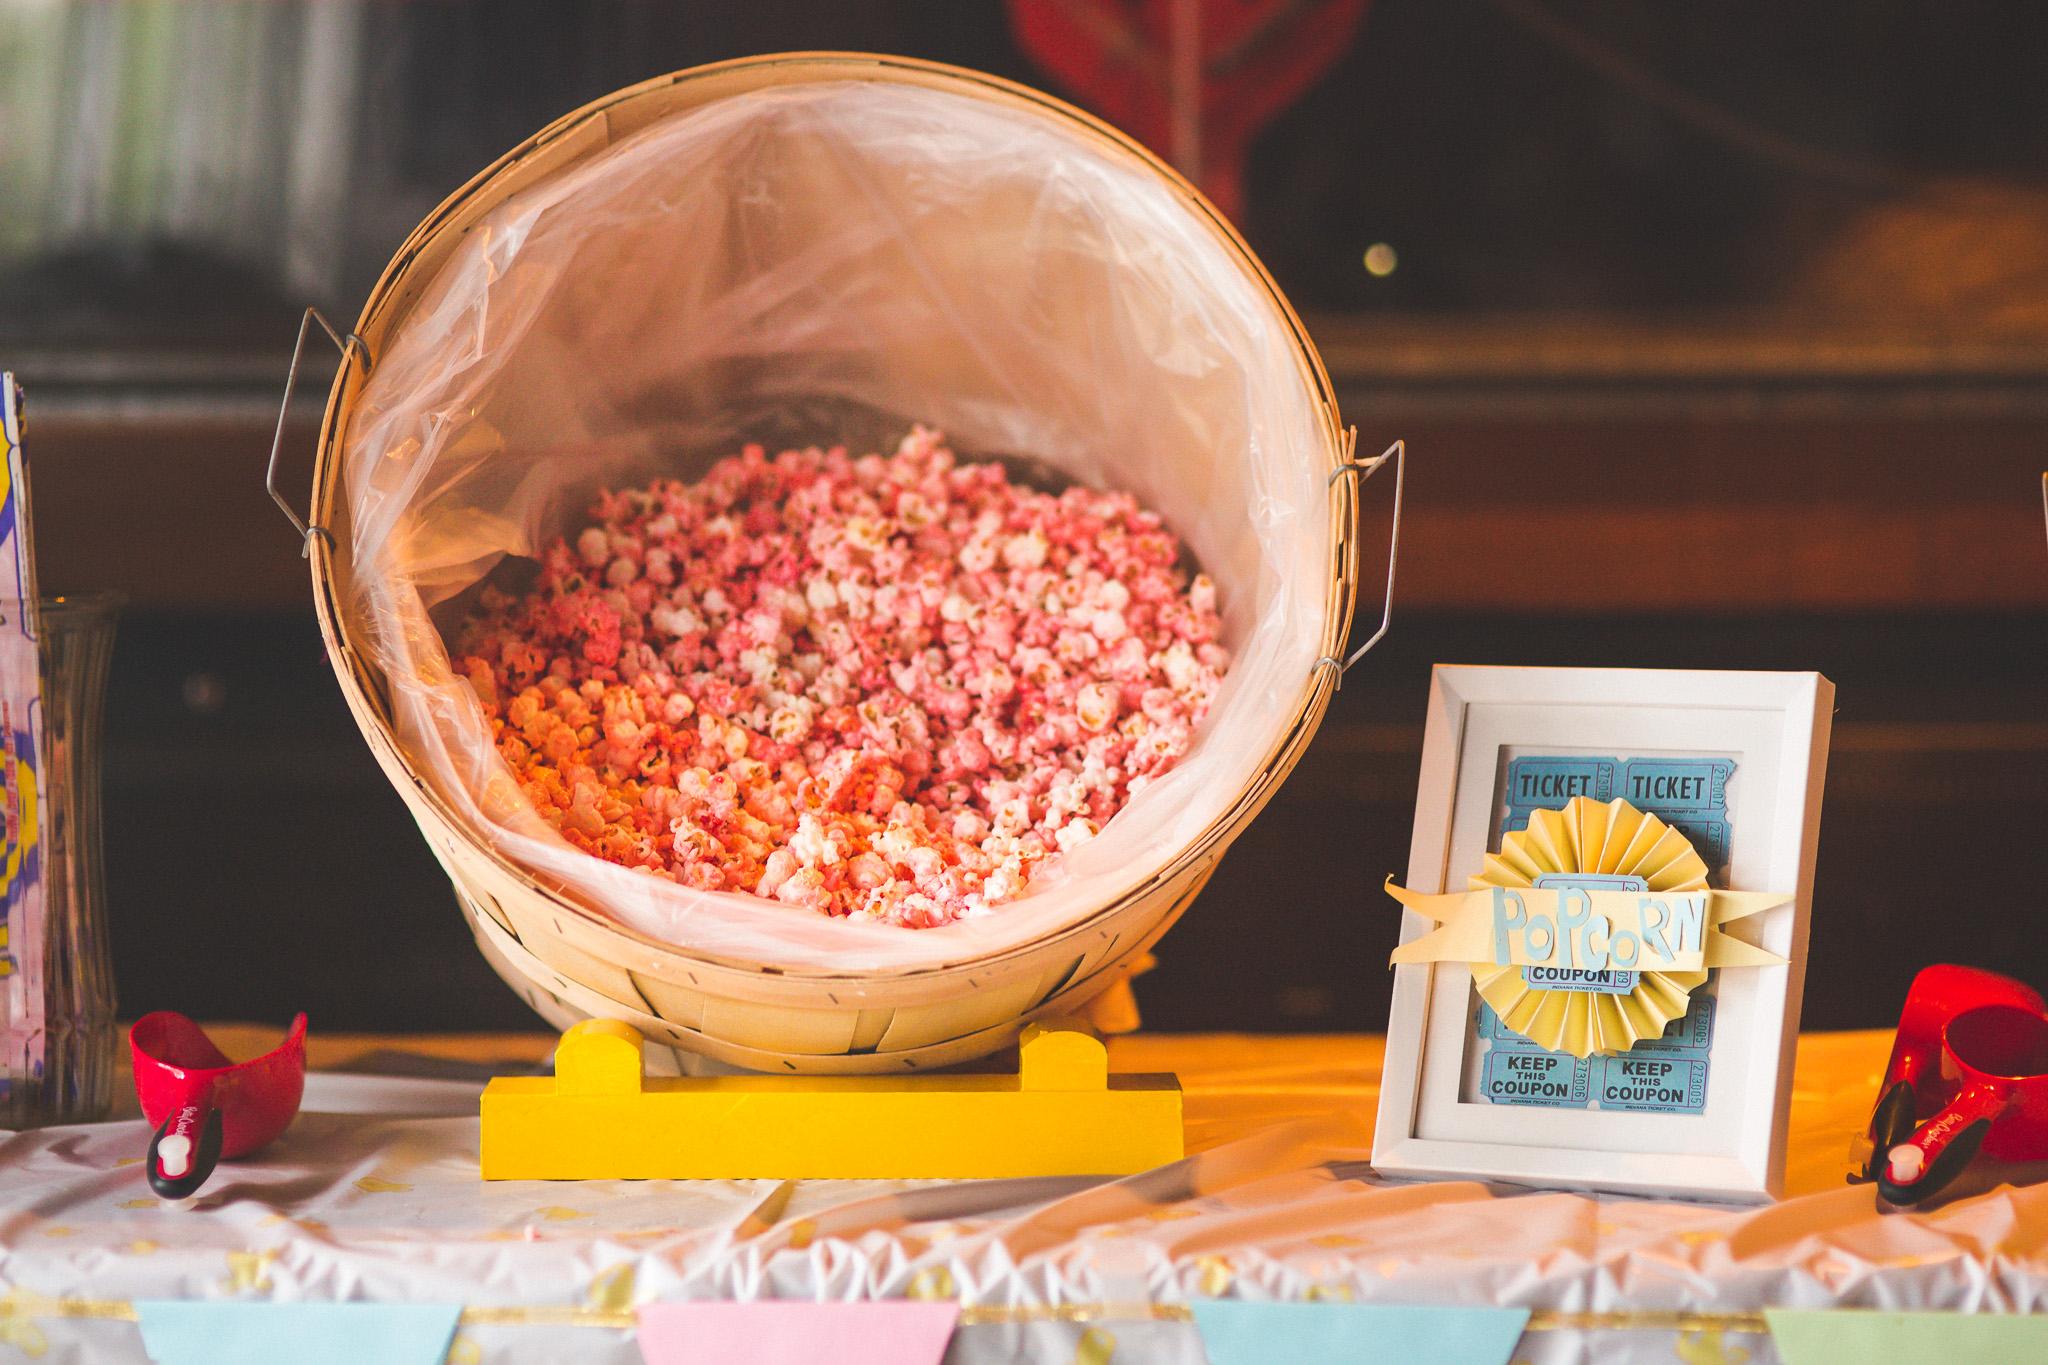 Carnival-wedding-theme-popcorn